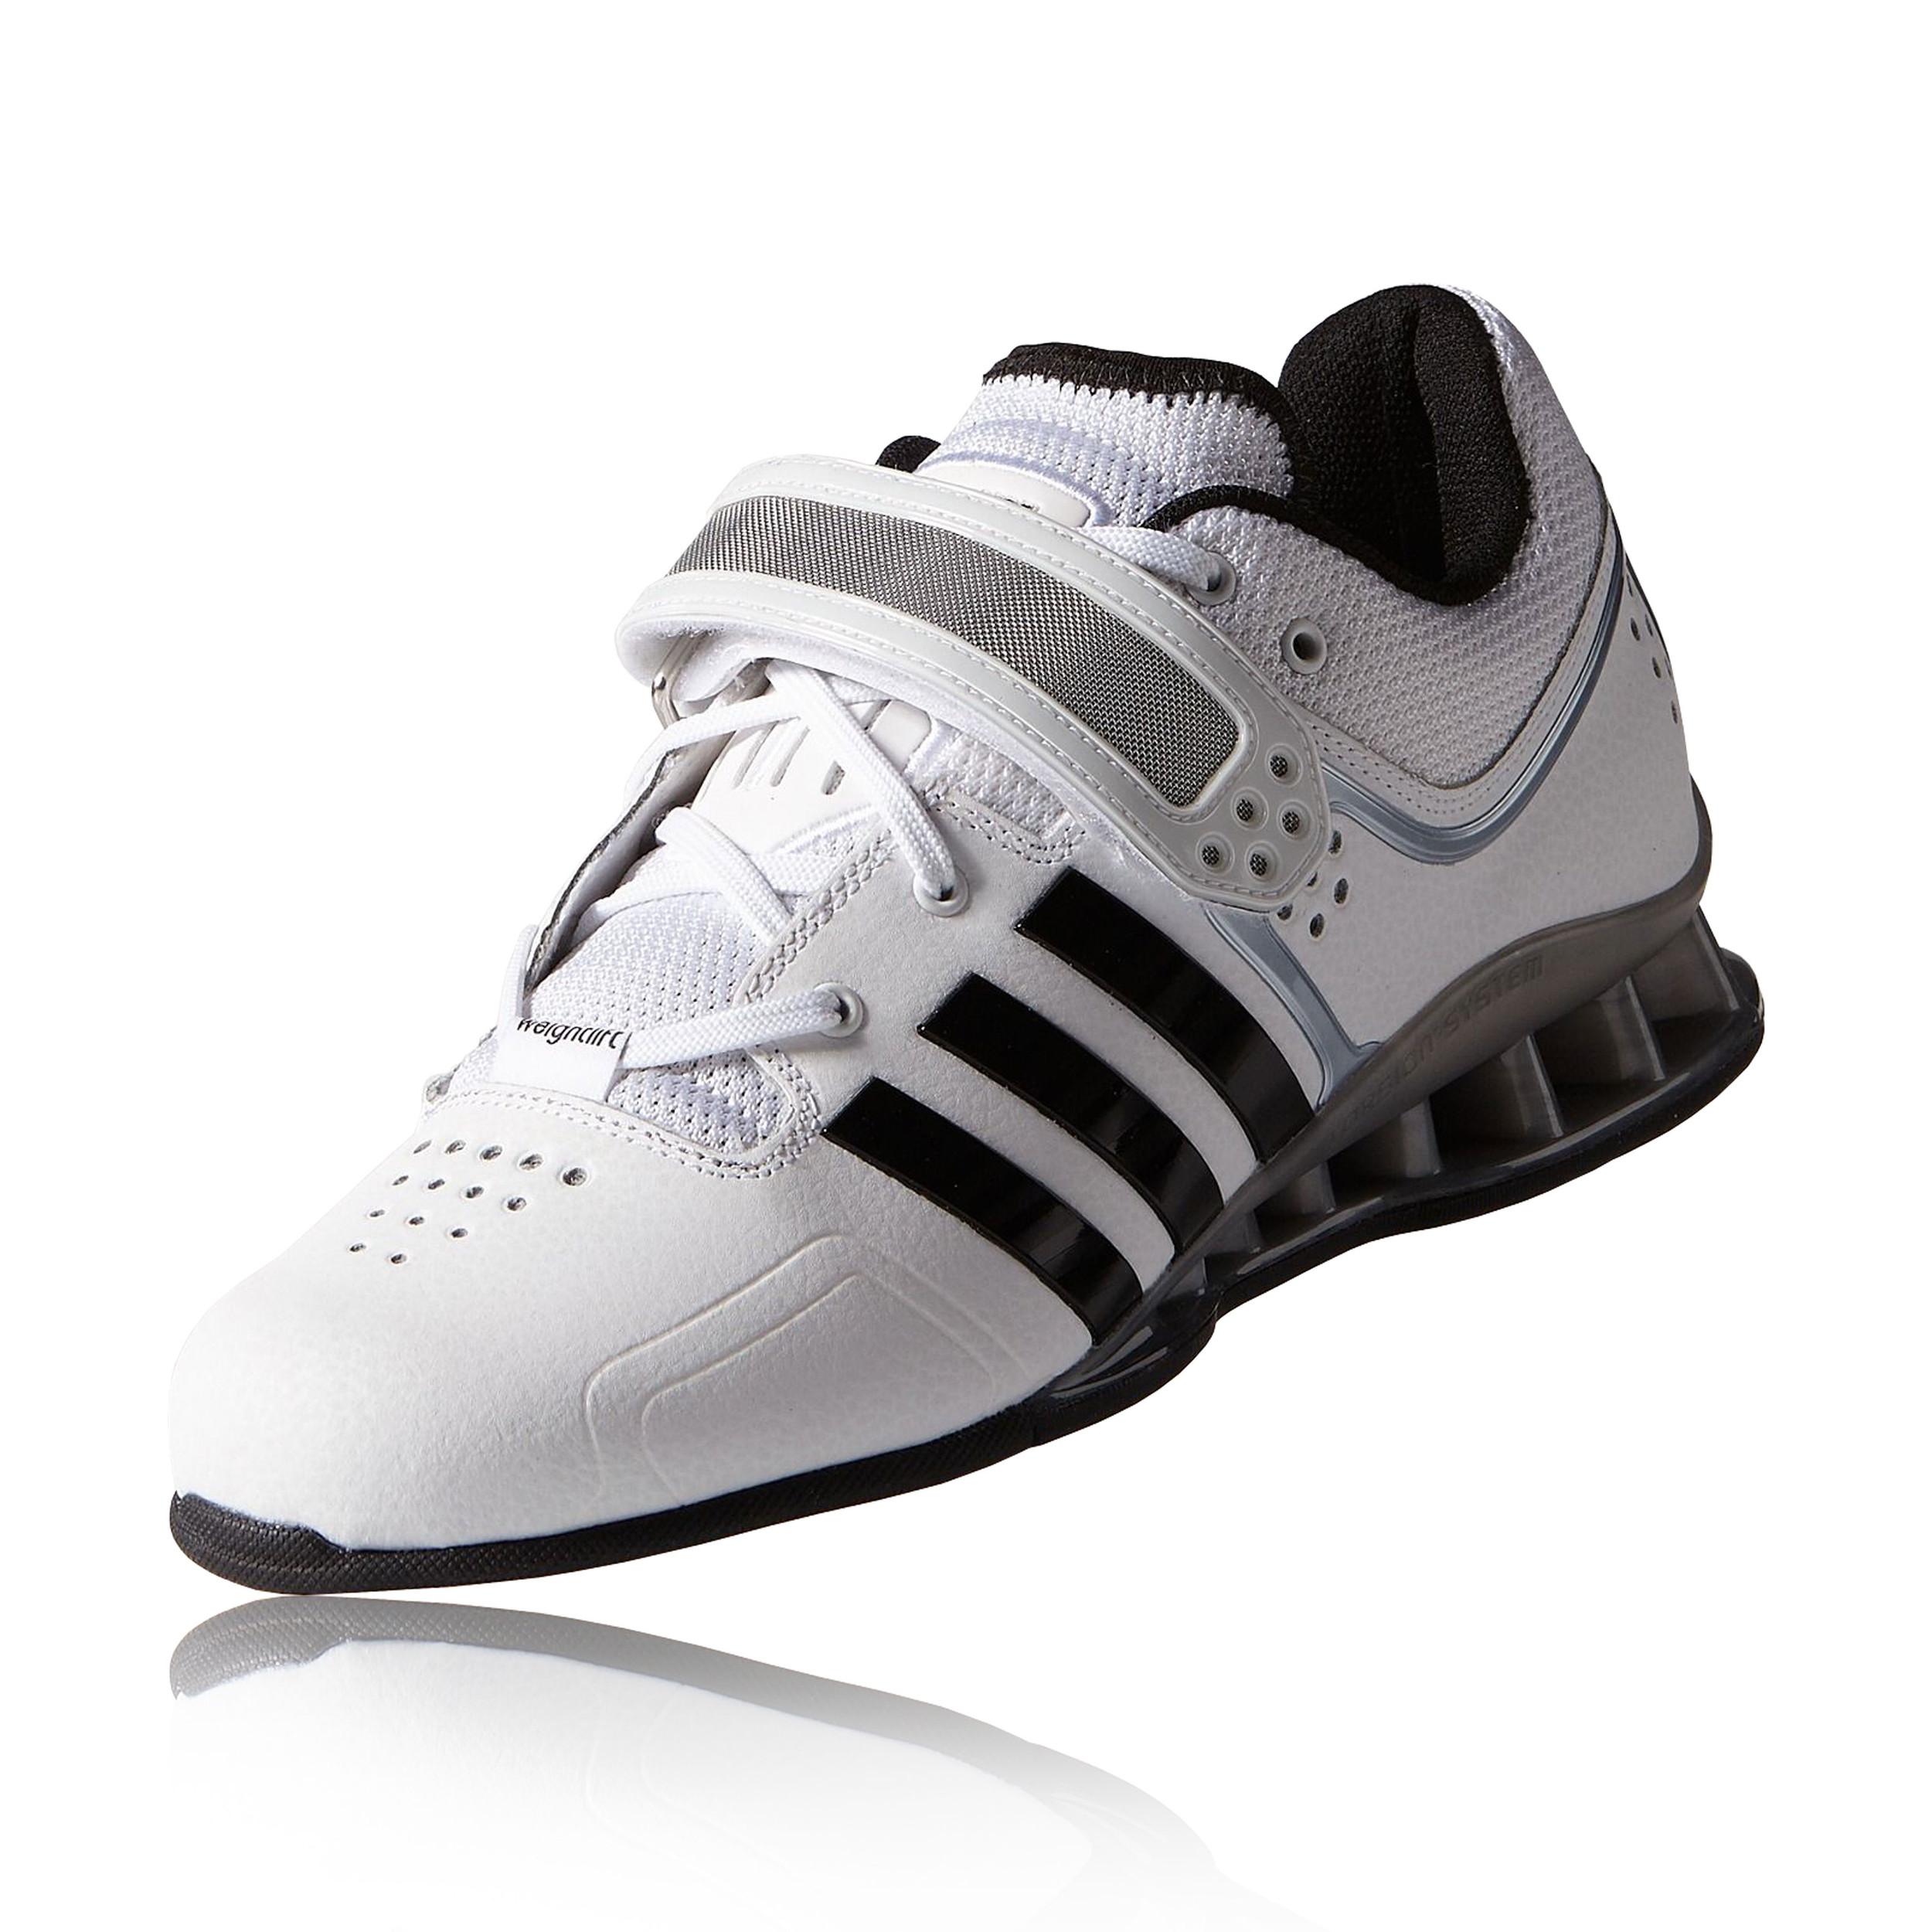 Adidas Shoes Price In Sri Lanka